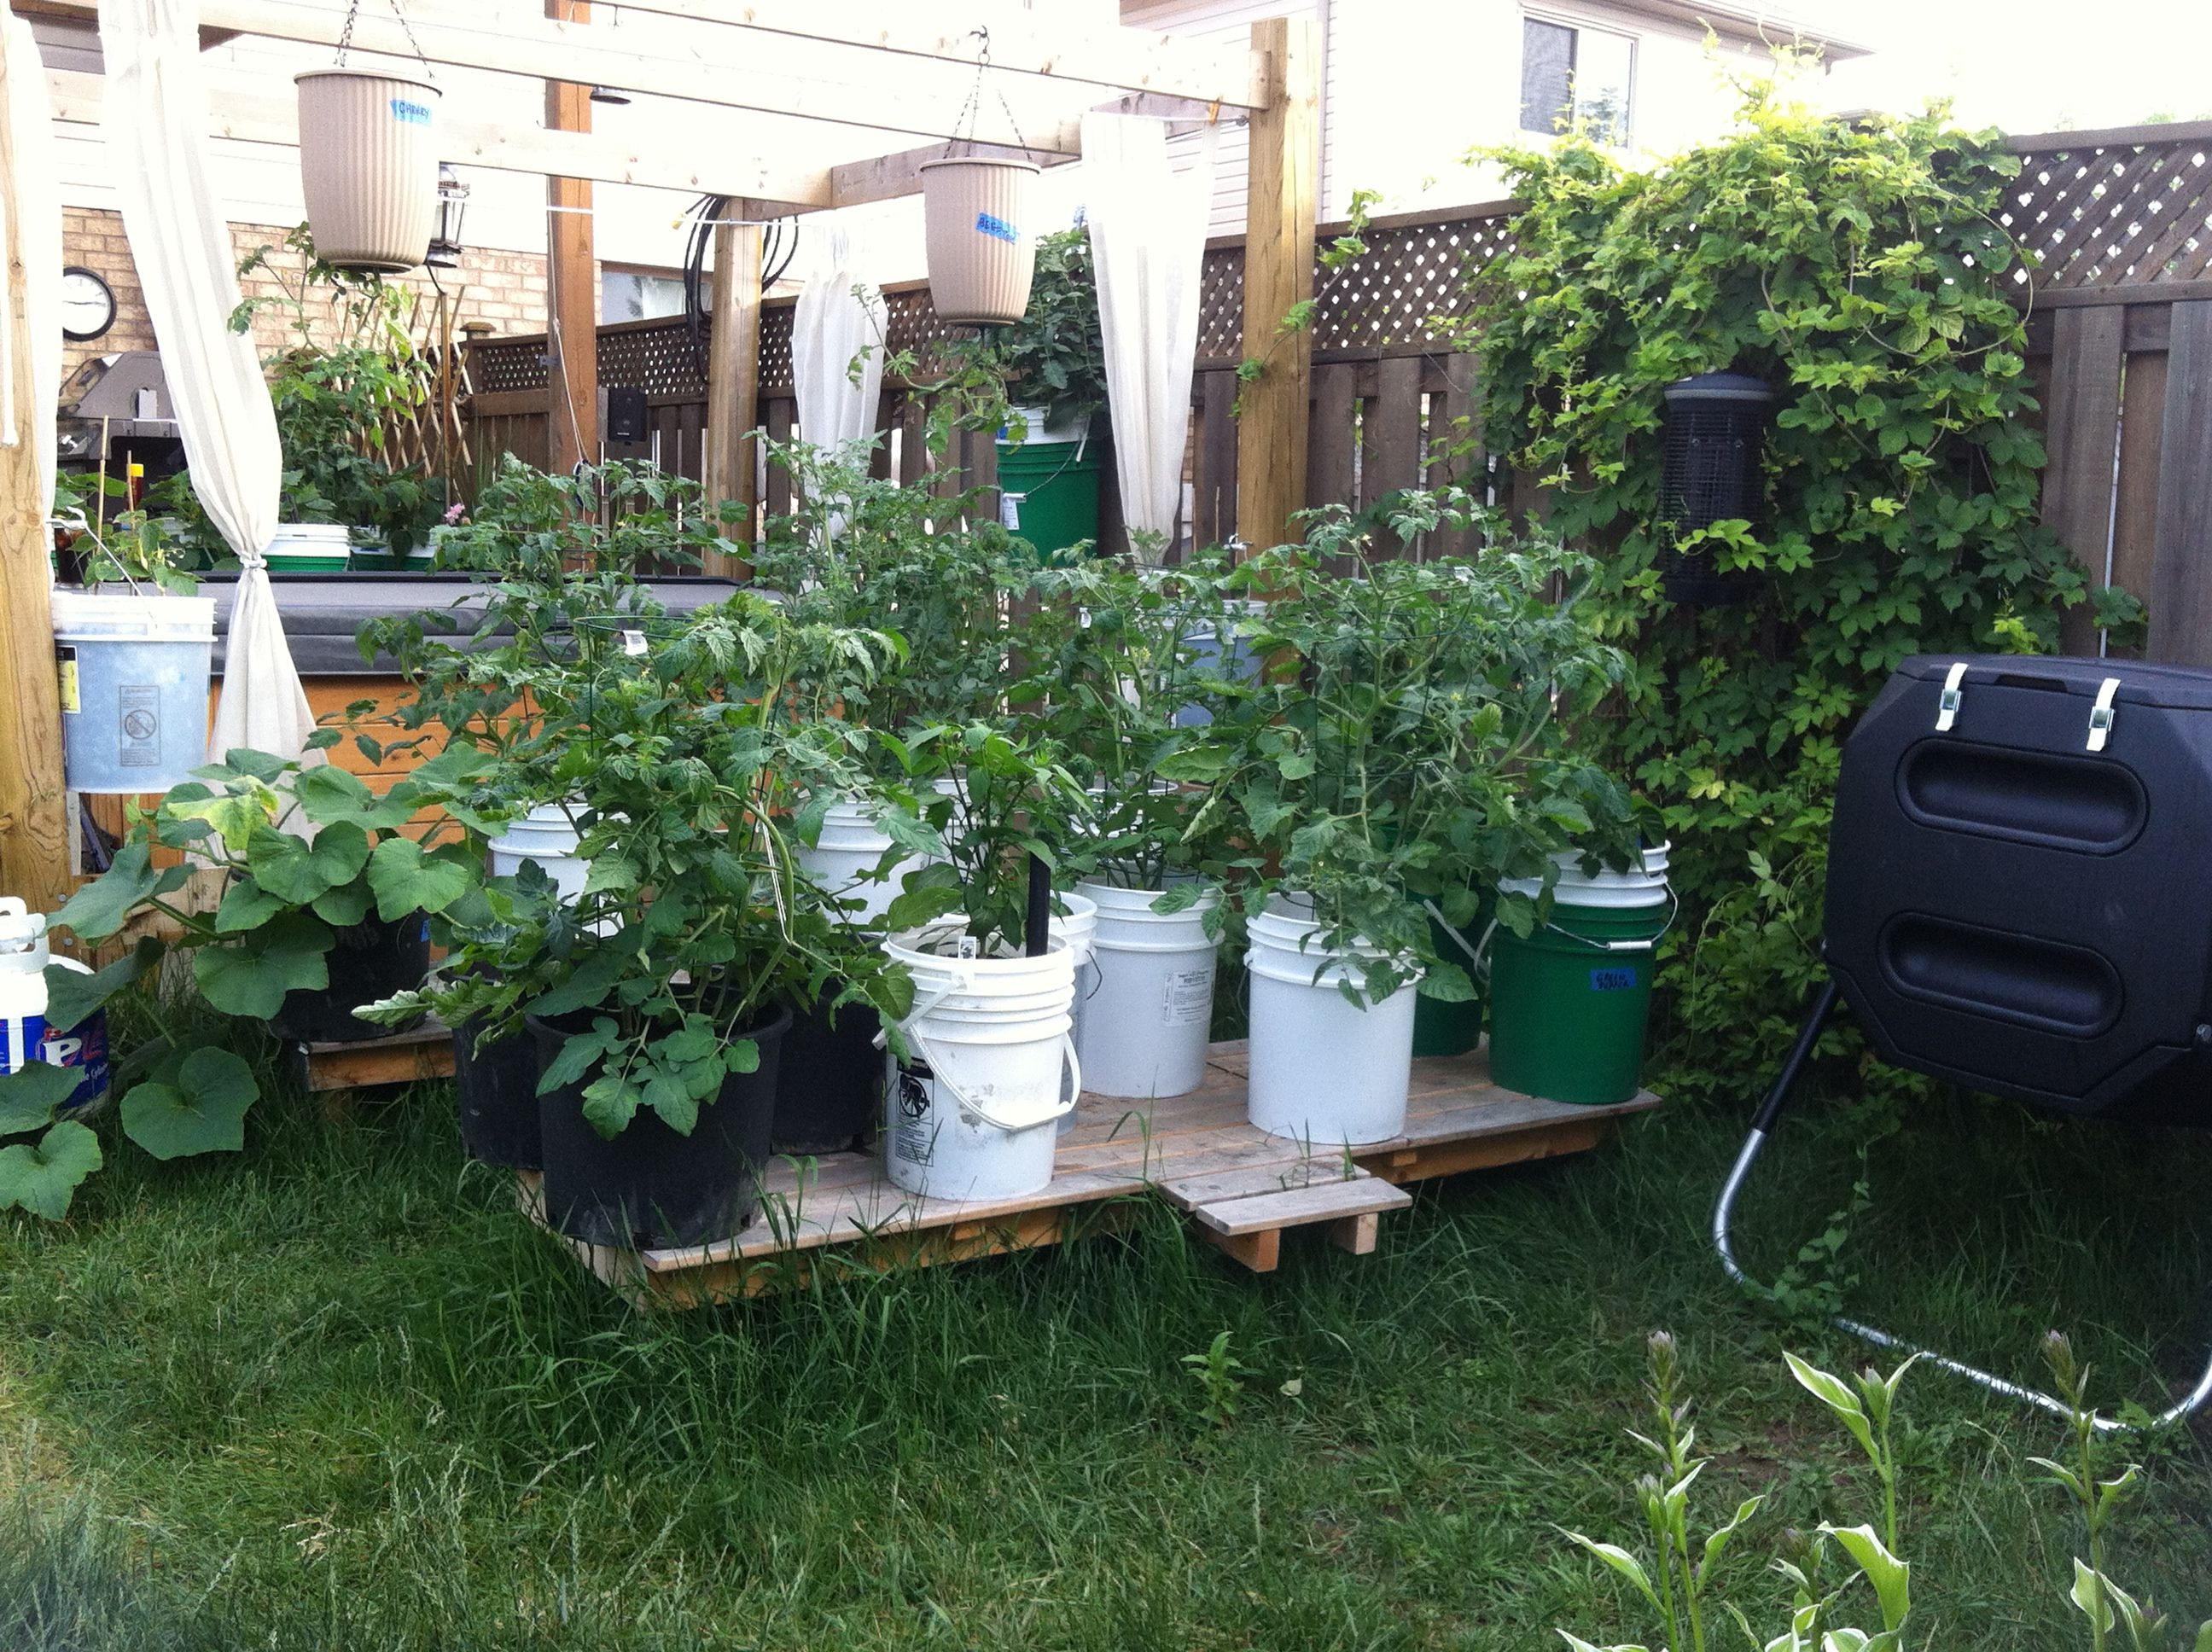 5 gallon bucket garden raised up for easier access for Gardening 5 gallon bucket